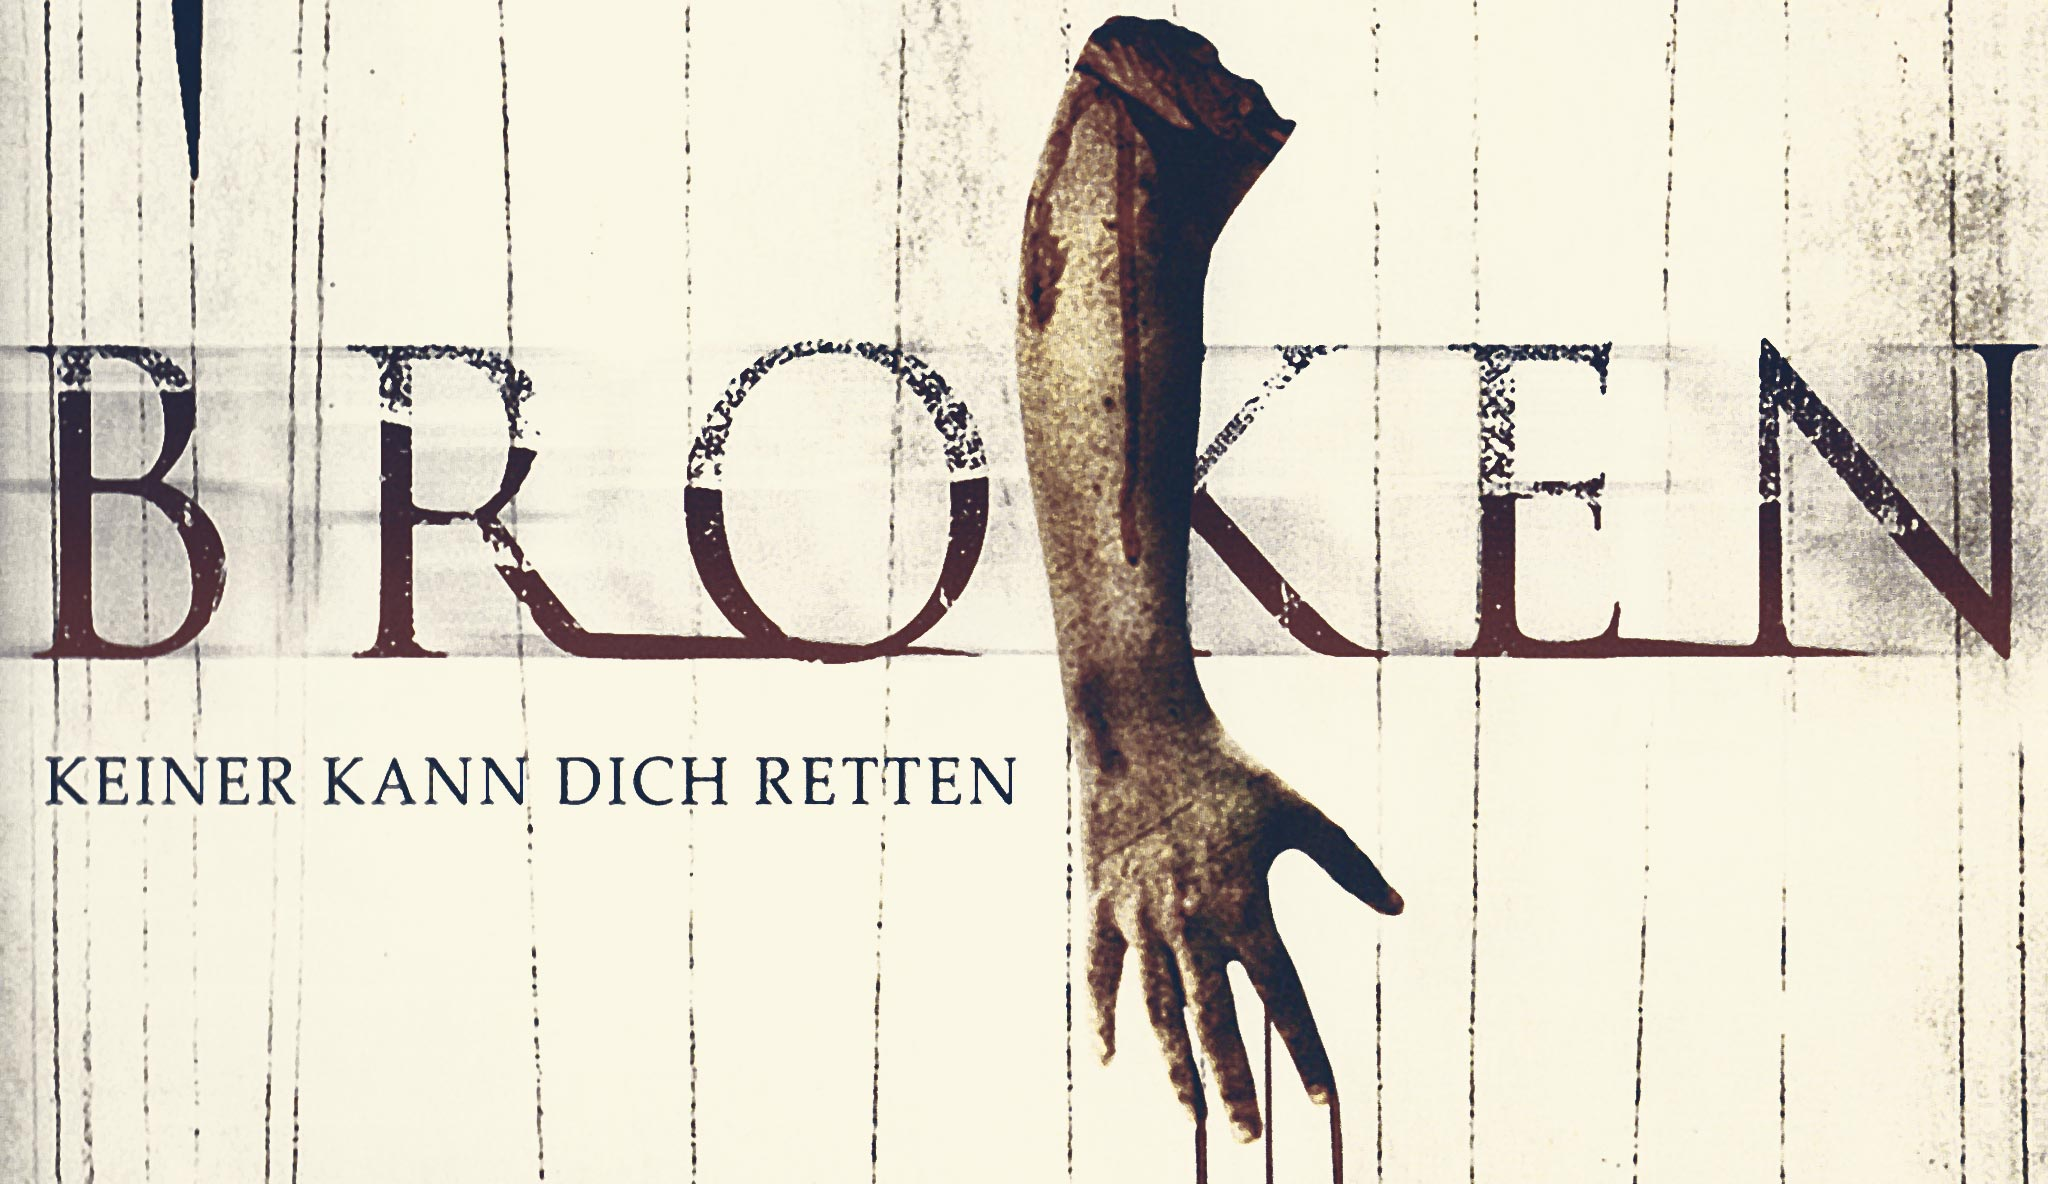 broken-keiner-kann-dich-retten\header.jpg